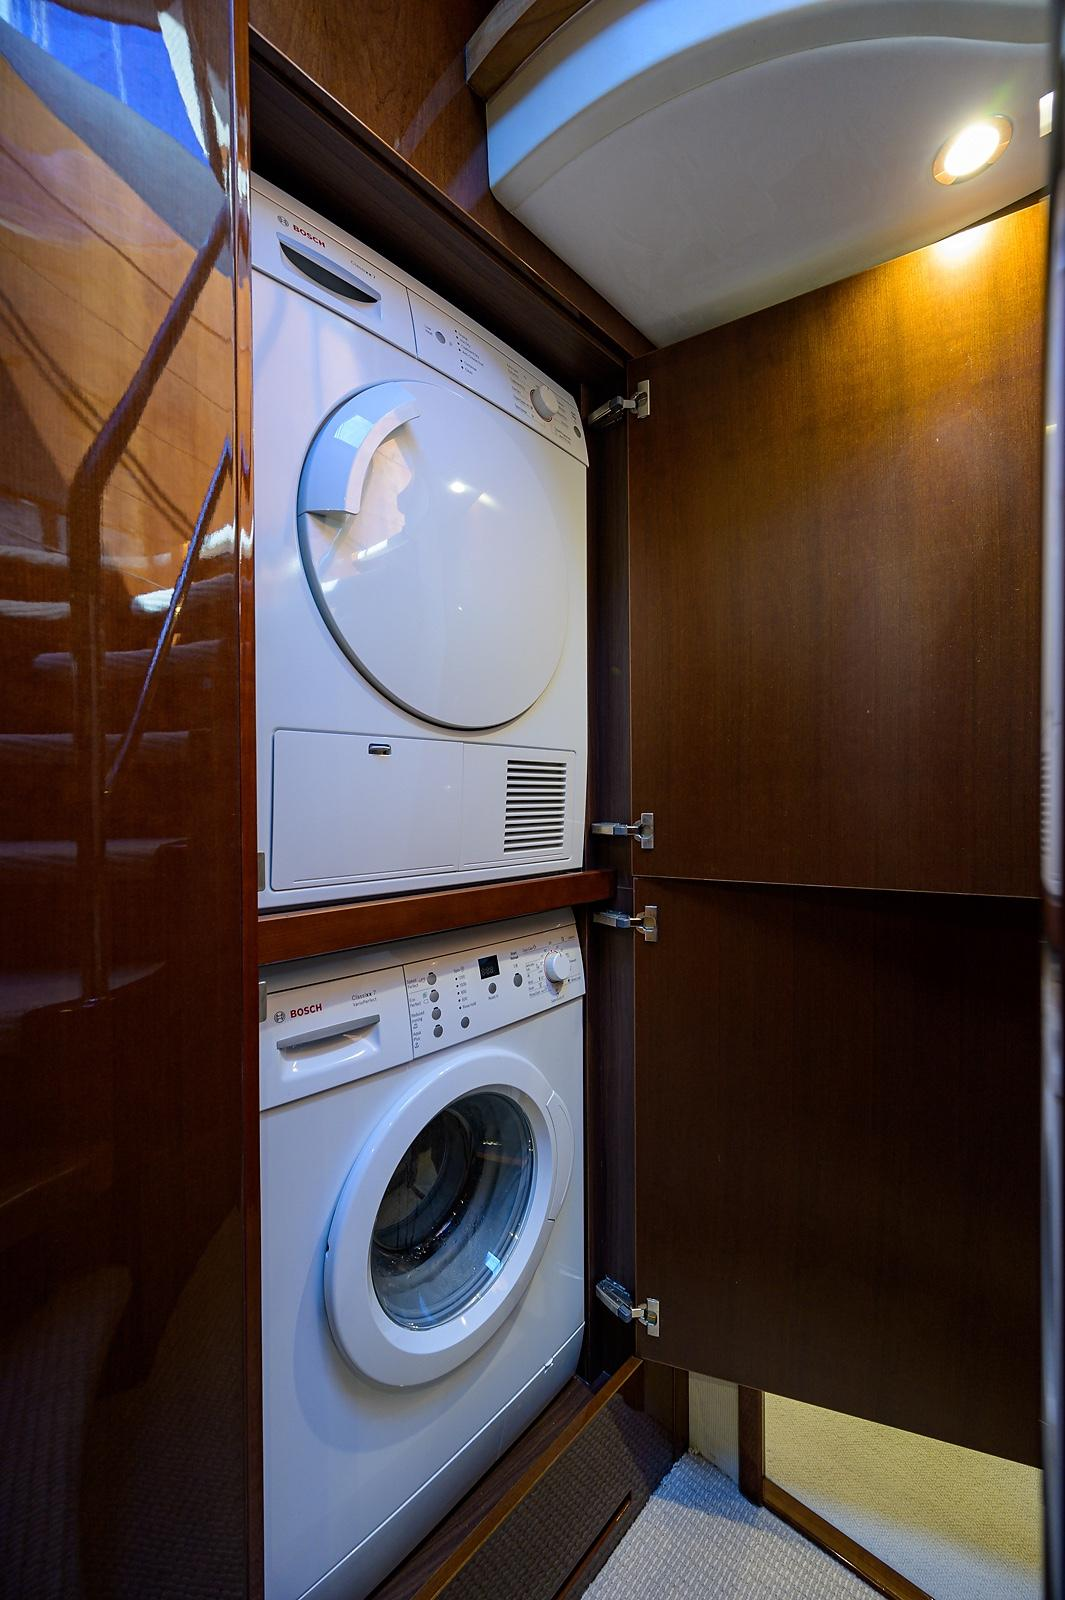 NIKITA 33 Washer/ Dryer